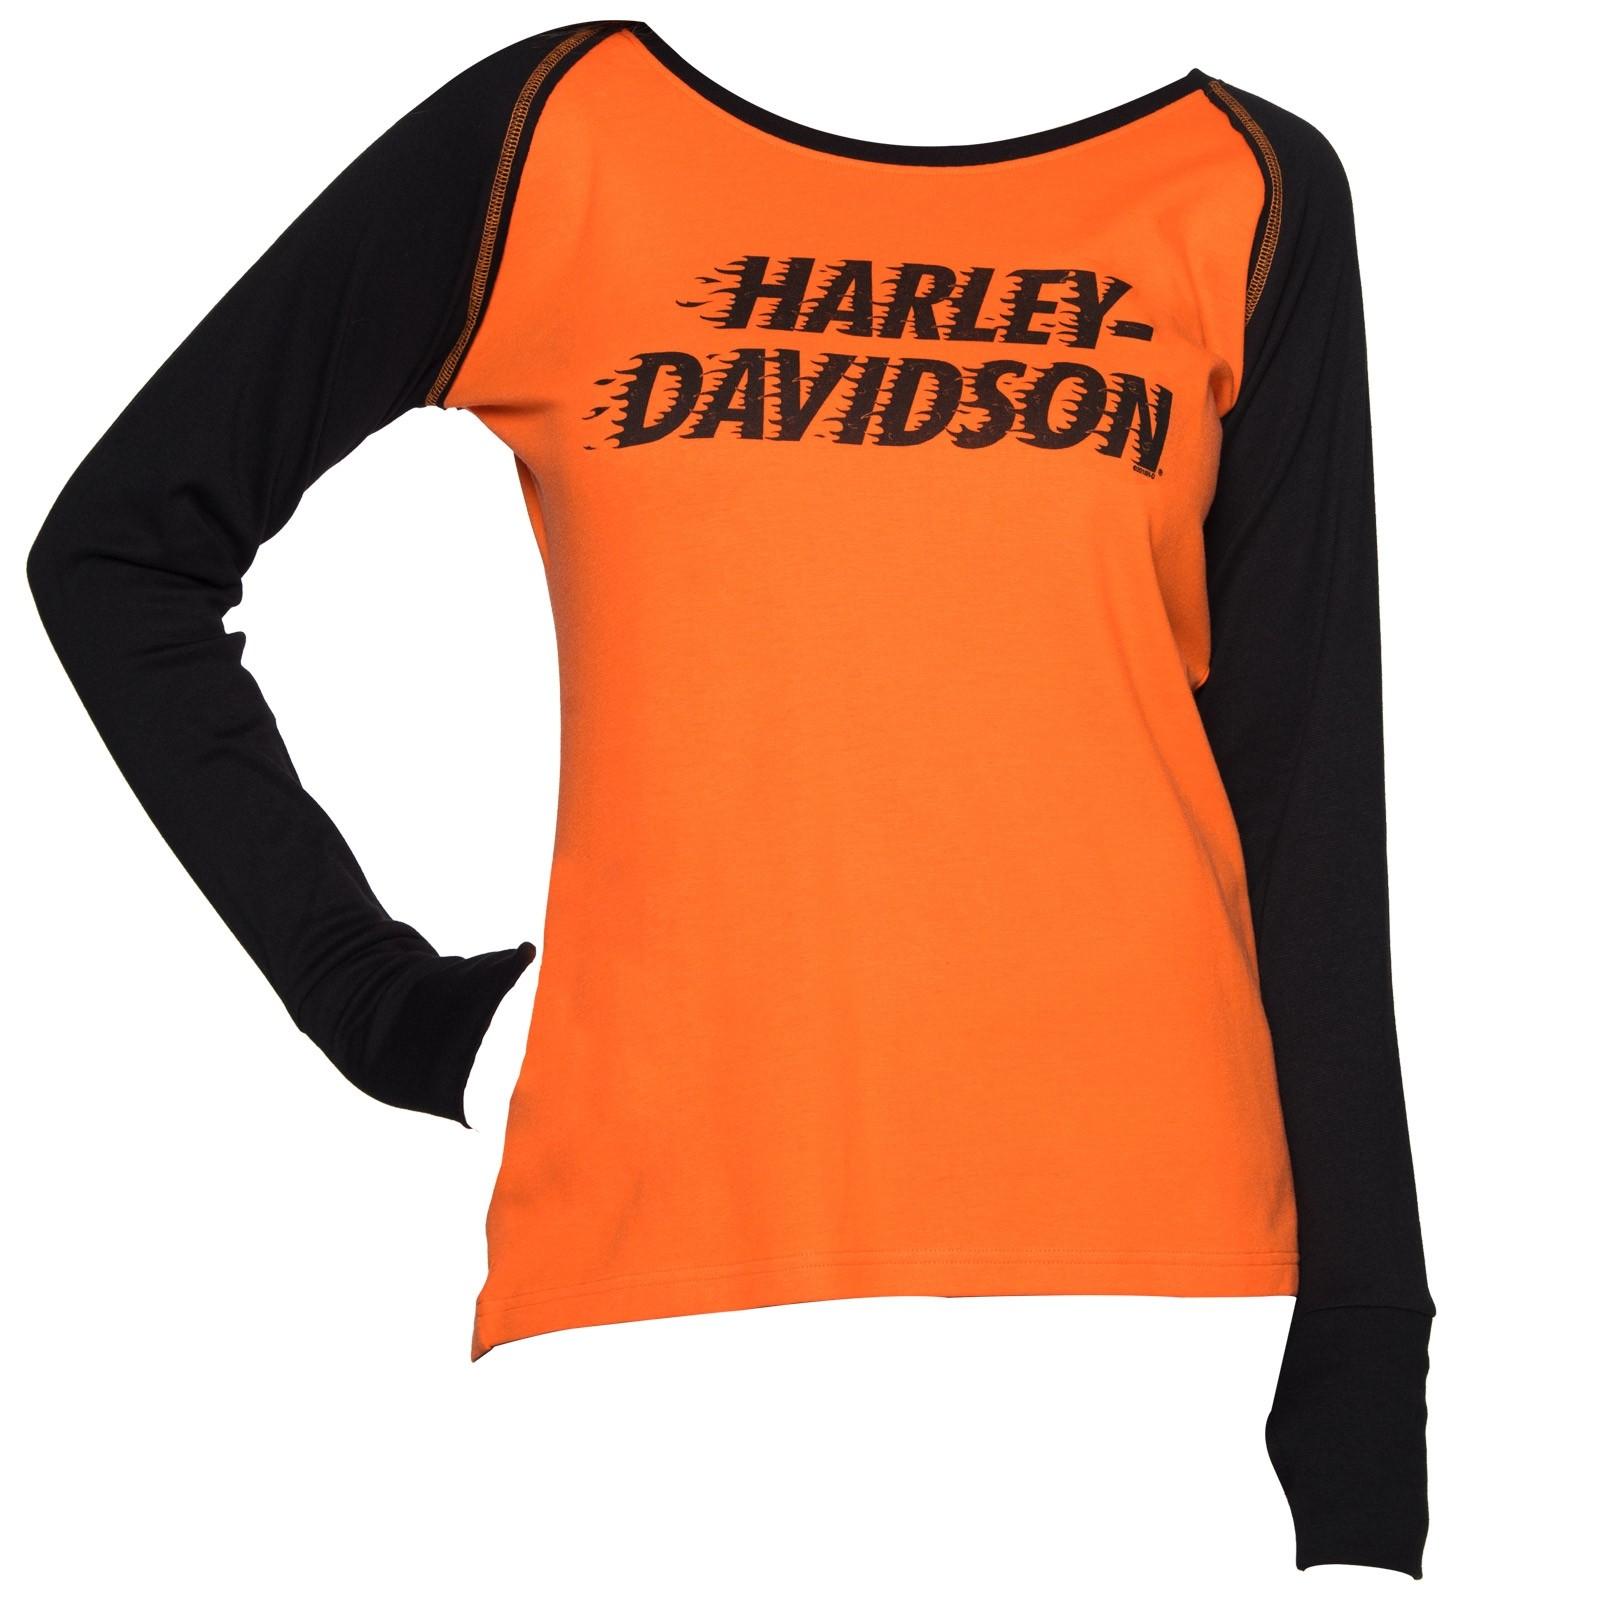 Harley-Davidson Women's Long-Sleeve Raglan Top - Ramstein Air Base | Light It Up